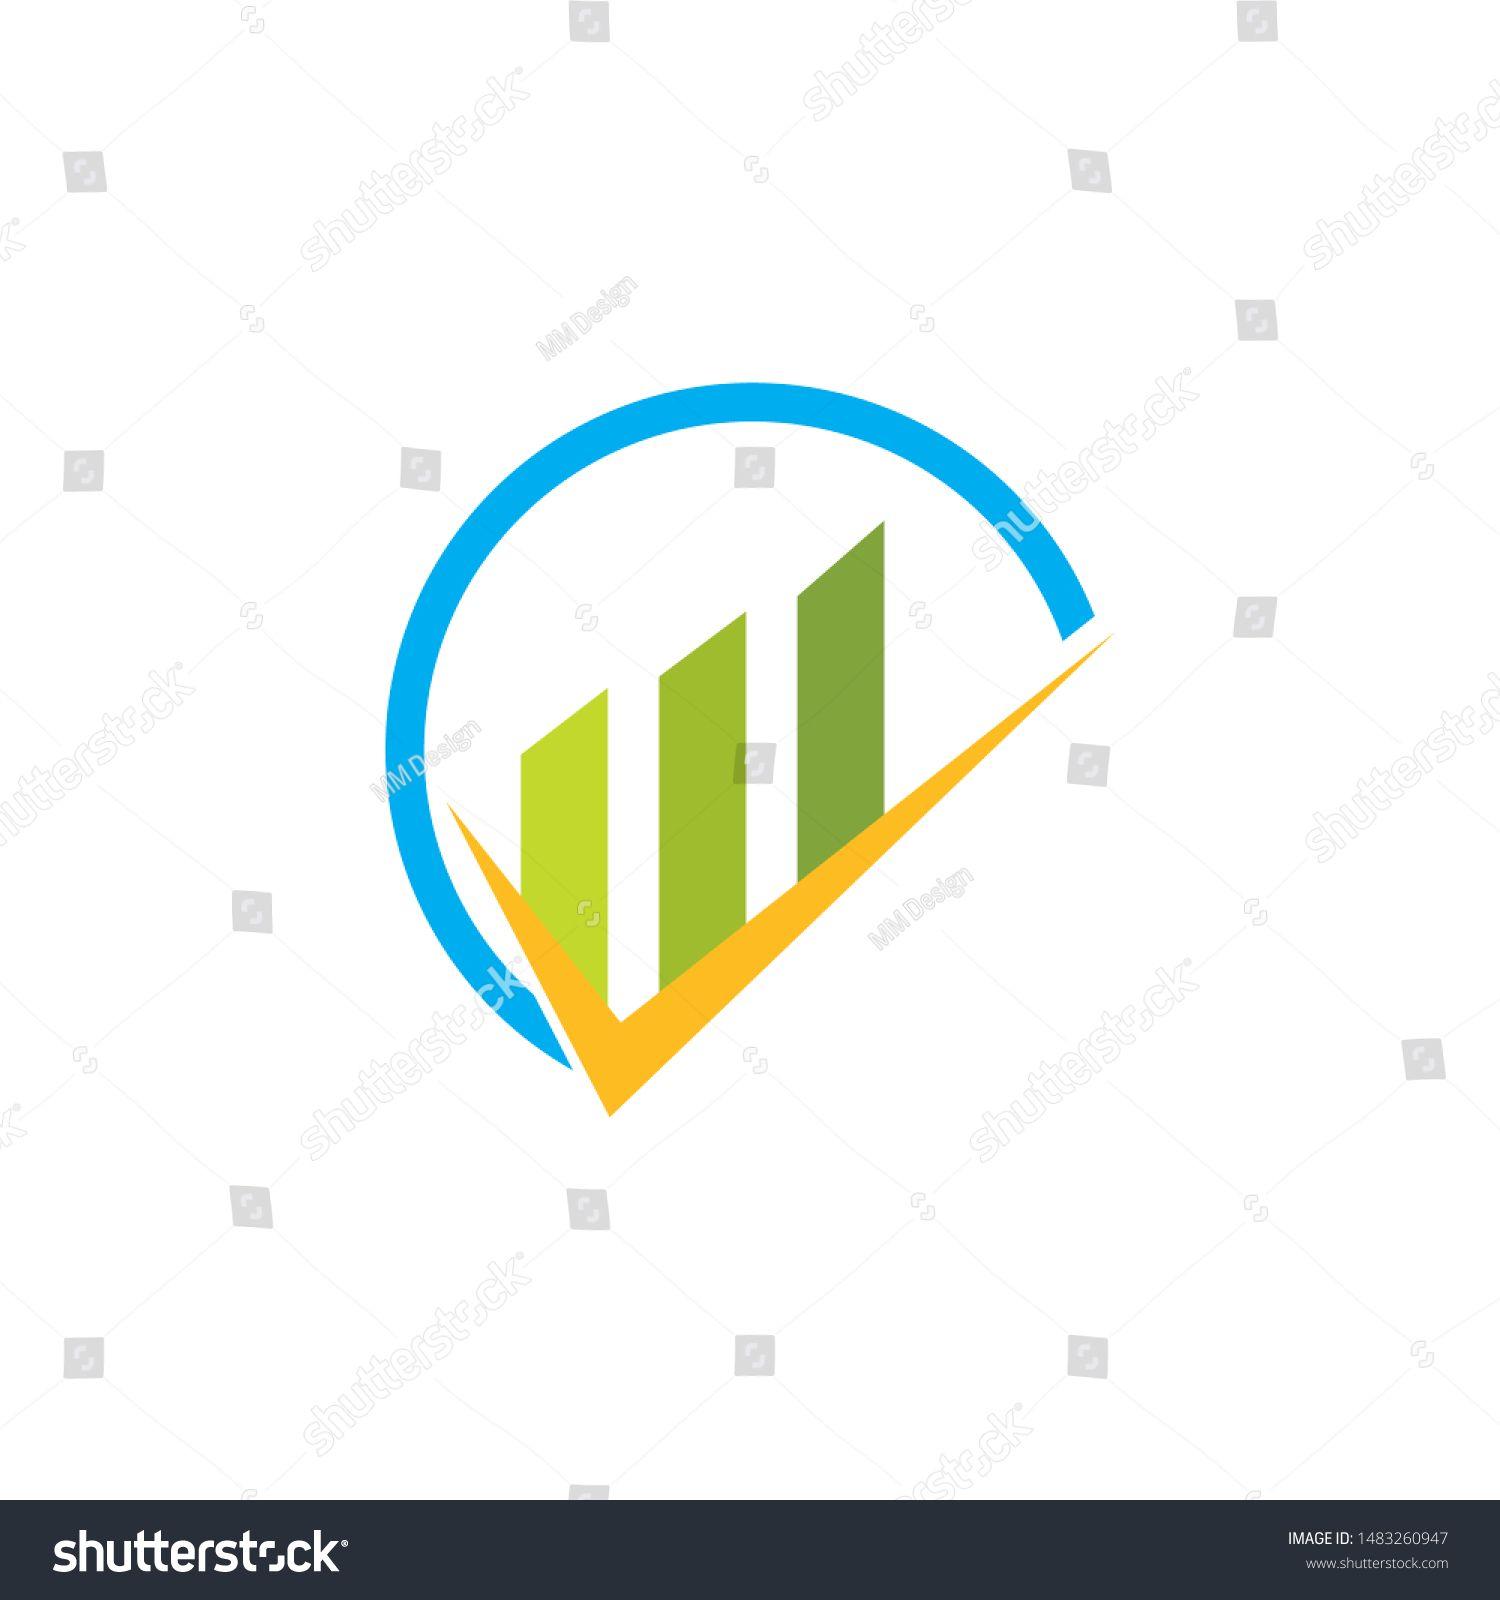 Business Finance Professional Logo Template Vector Sponsored Affiliate Professional Finance Business Vector In 2020 Stock Market Flyer Design Logo Templates